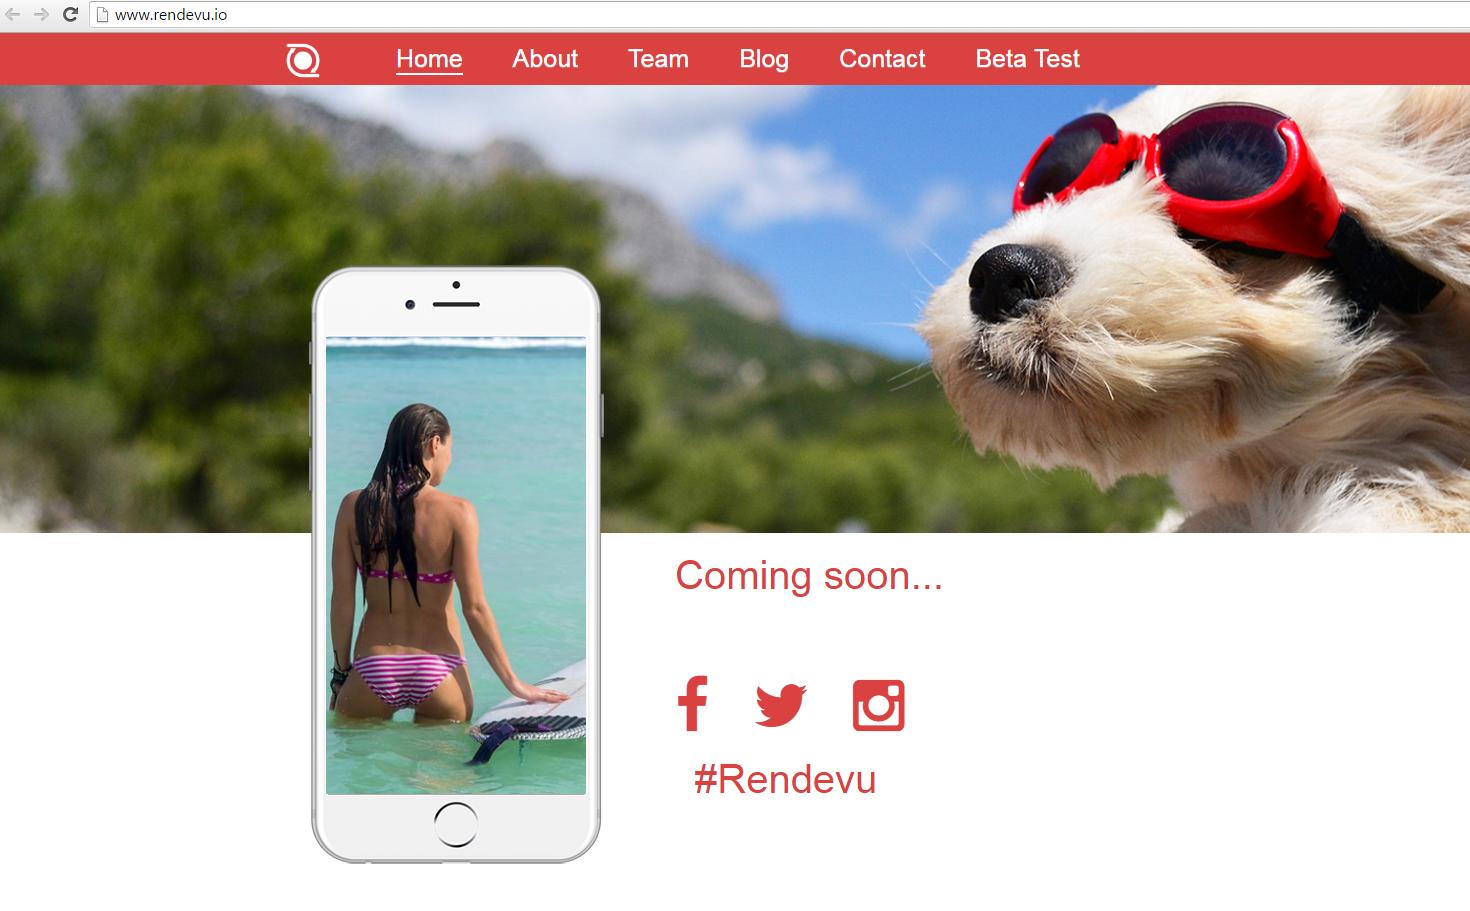 Rendevu - Capture the moment | FreelancerEtalase